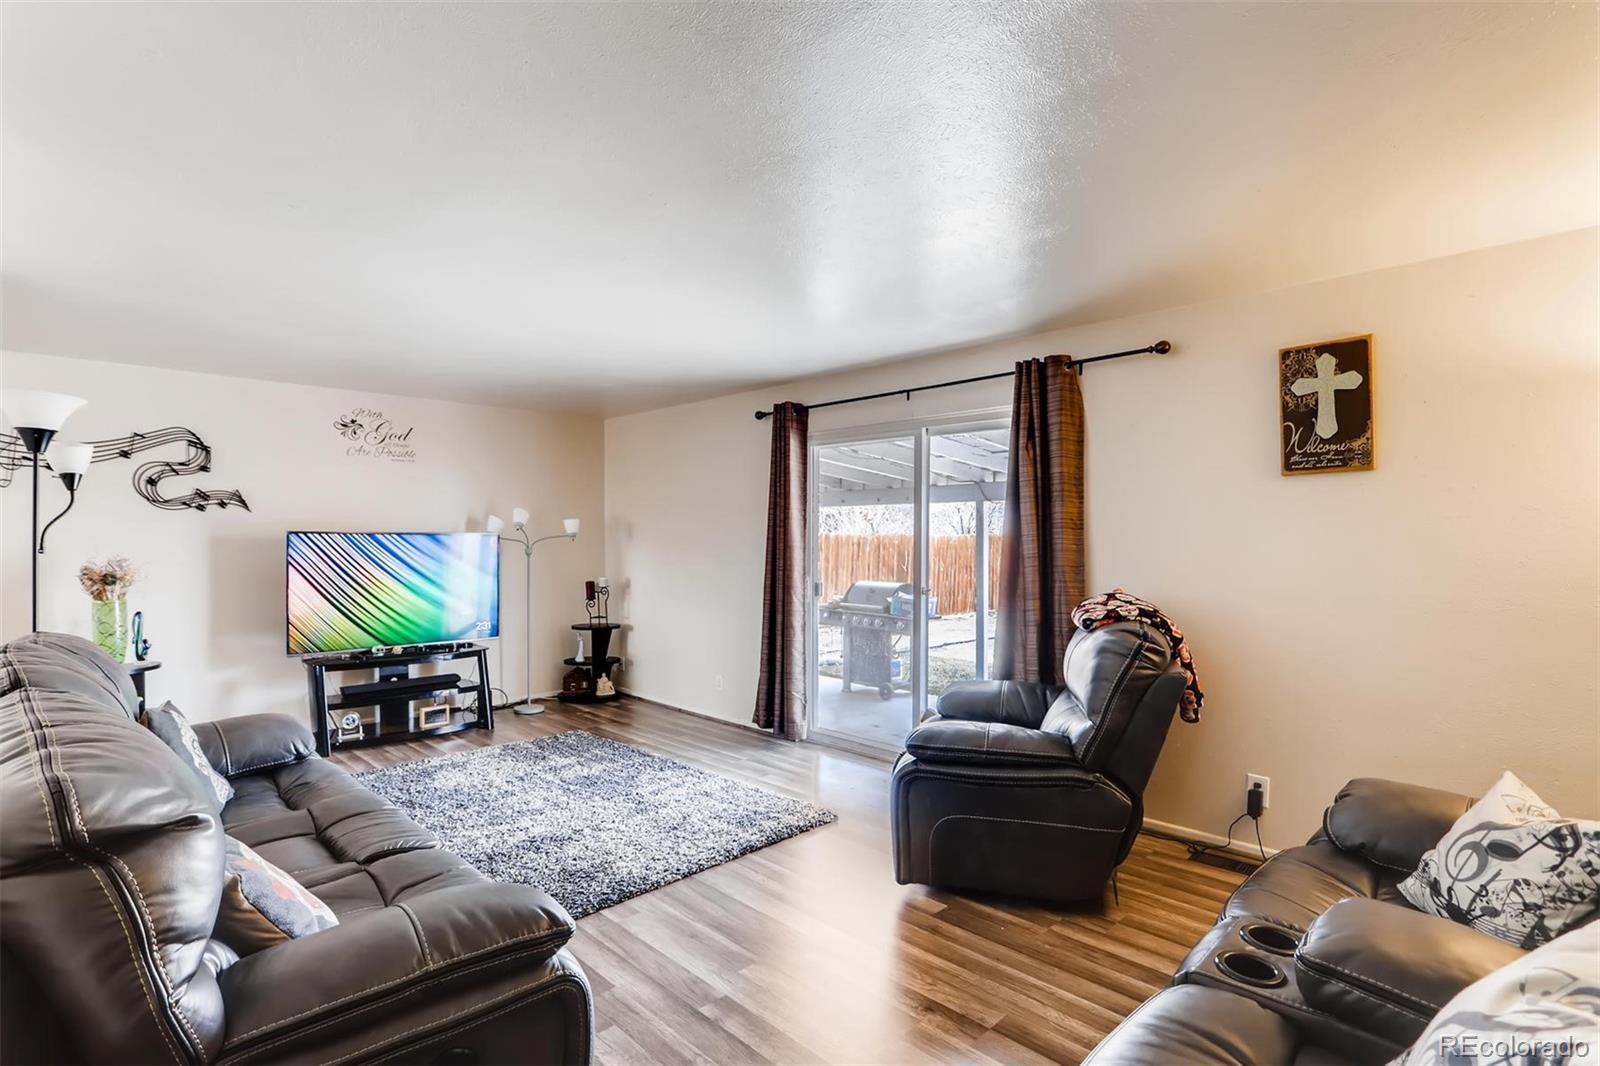 MLS# 7901545 - 2 - 1389 Douglas Drive, Denver, CO 80221